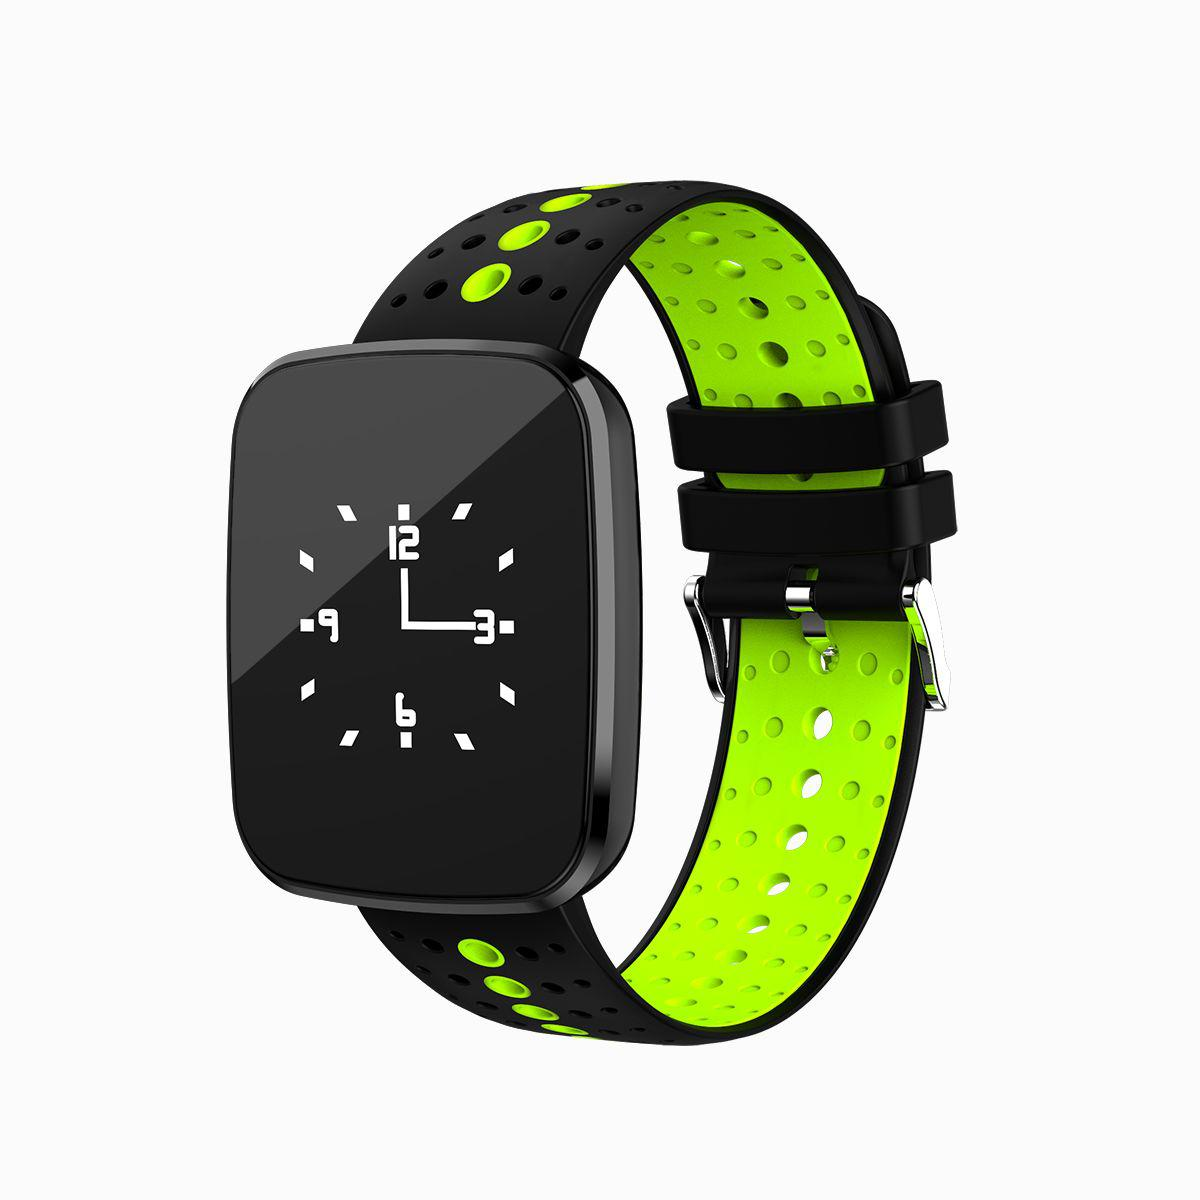 Фитнес-трекер Smart Band V6 Tonometr Черно-зеленый